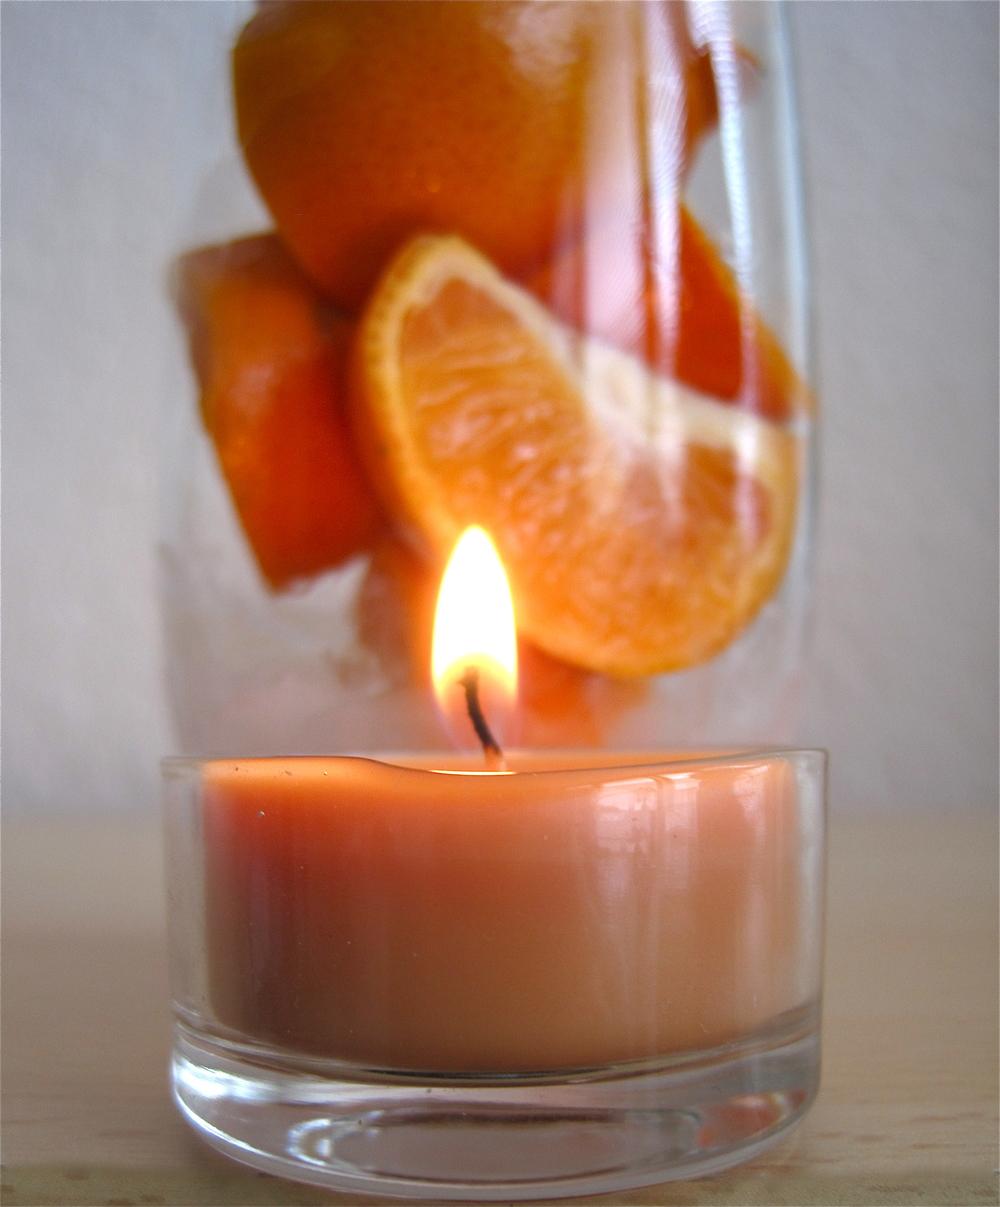 Aromawoche-Mittwoch-Mandarine-Kerze.JPG